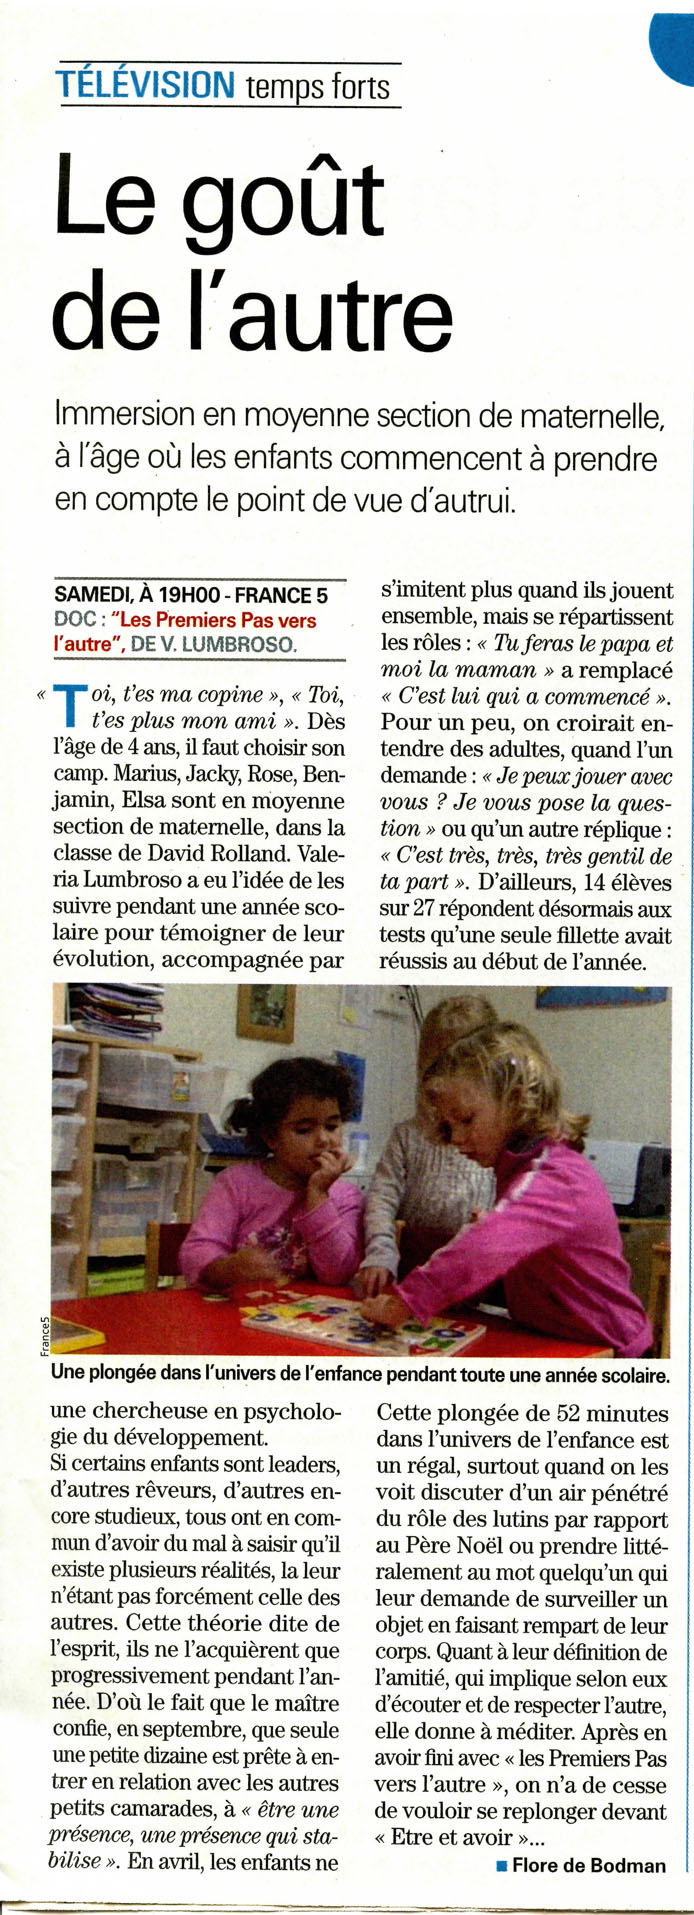 Valérie Lumbroso Presse Nouvel Observateur obs